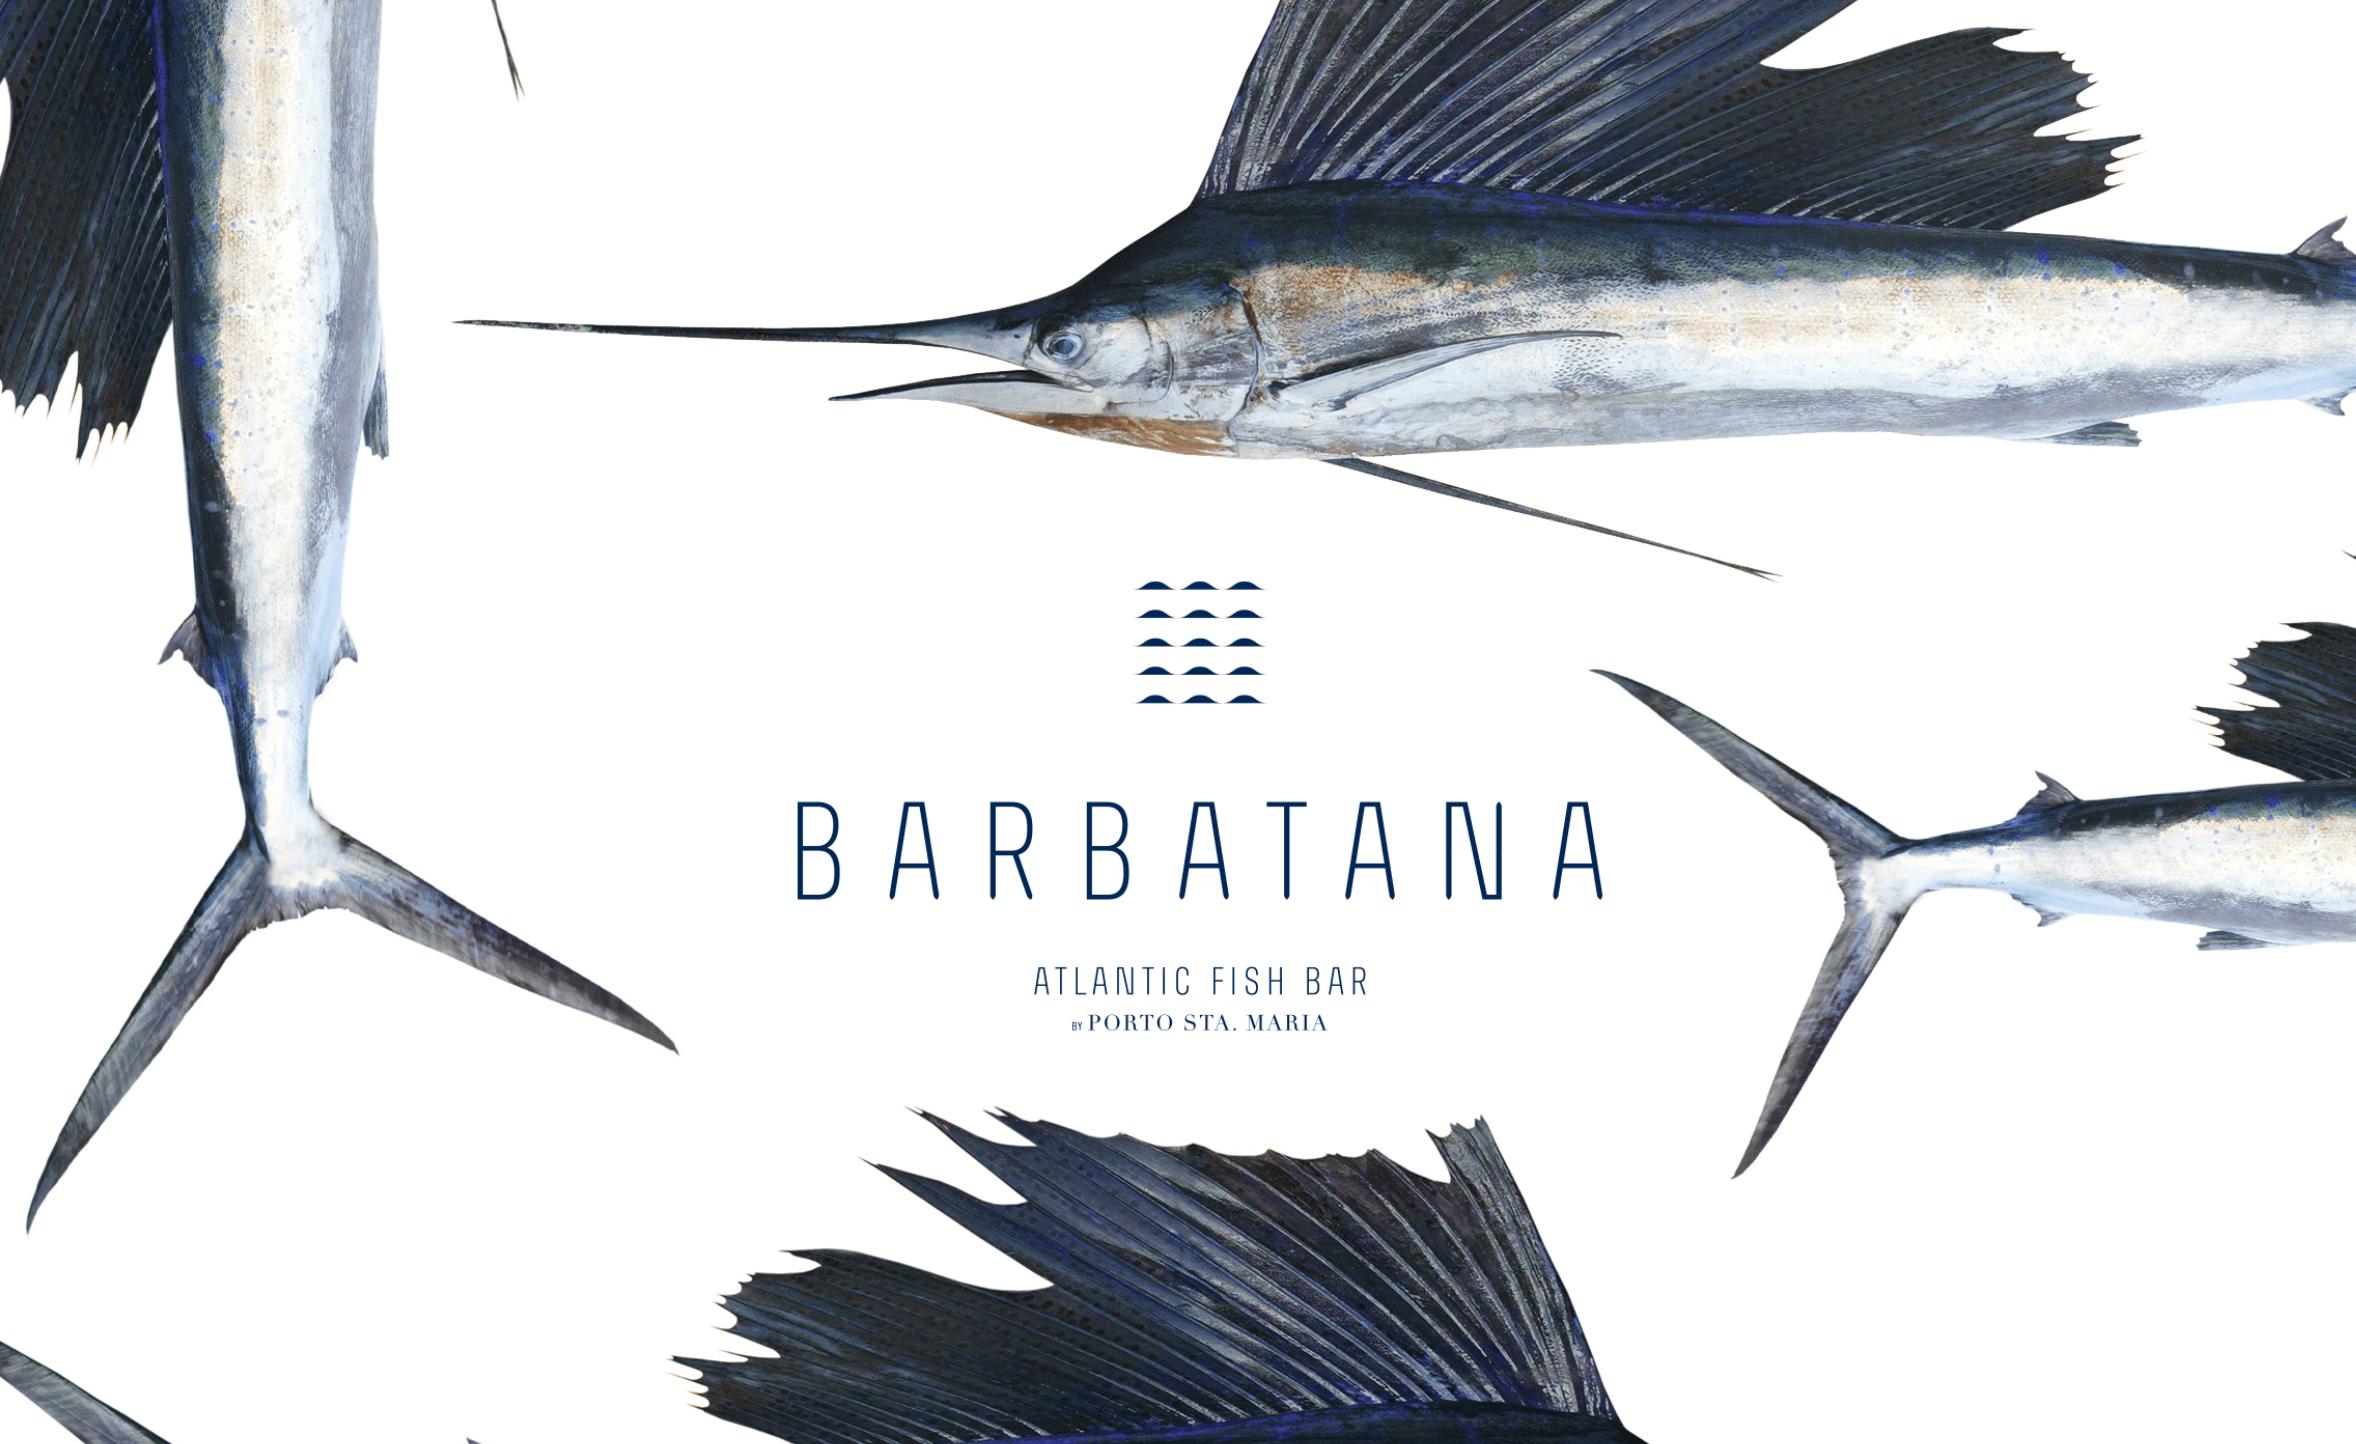 Barbatana restaurant brand logo mood